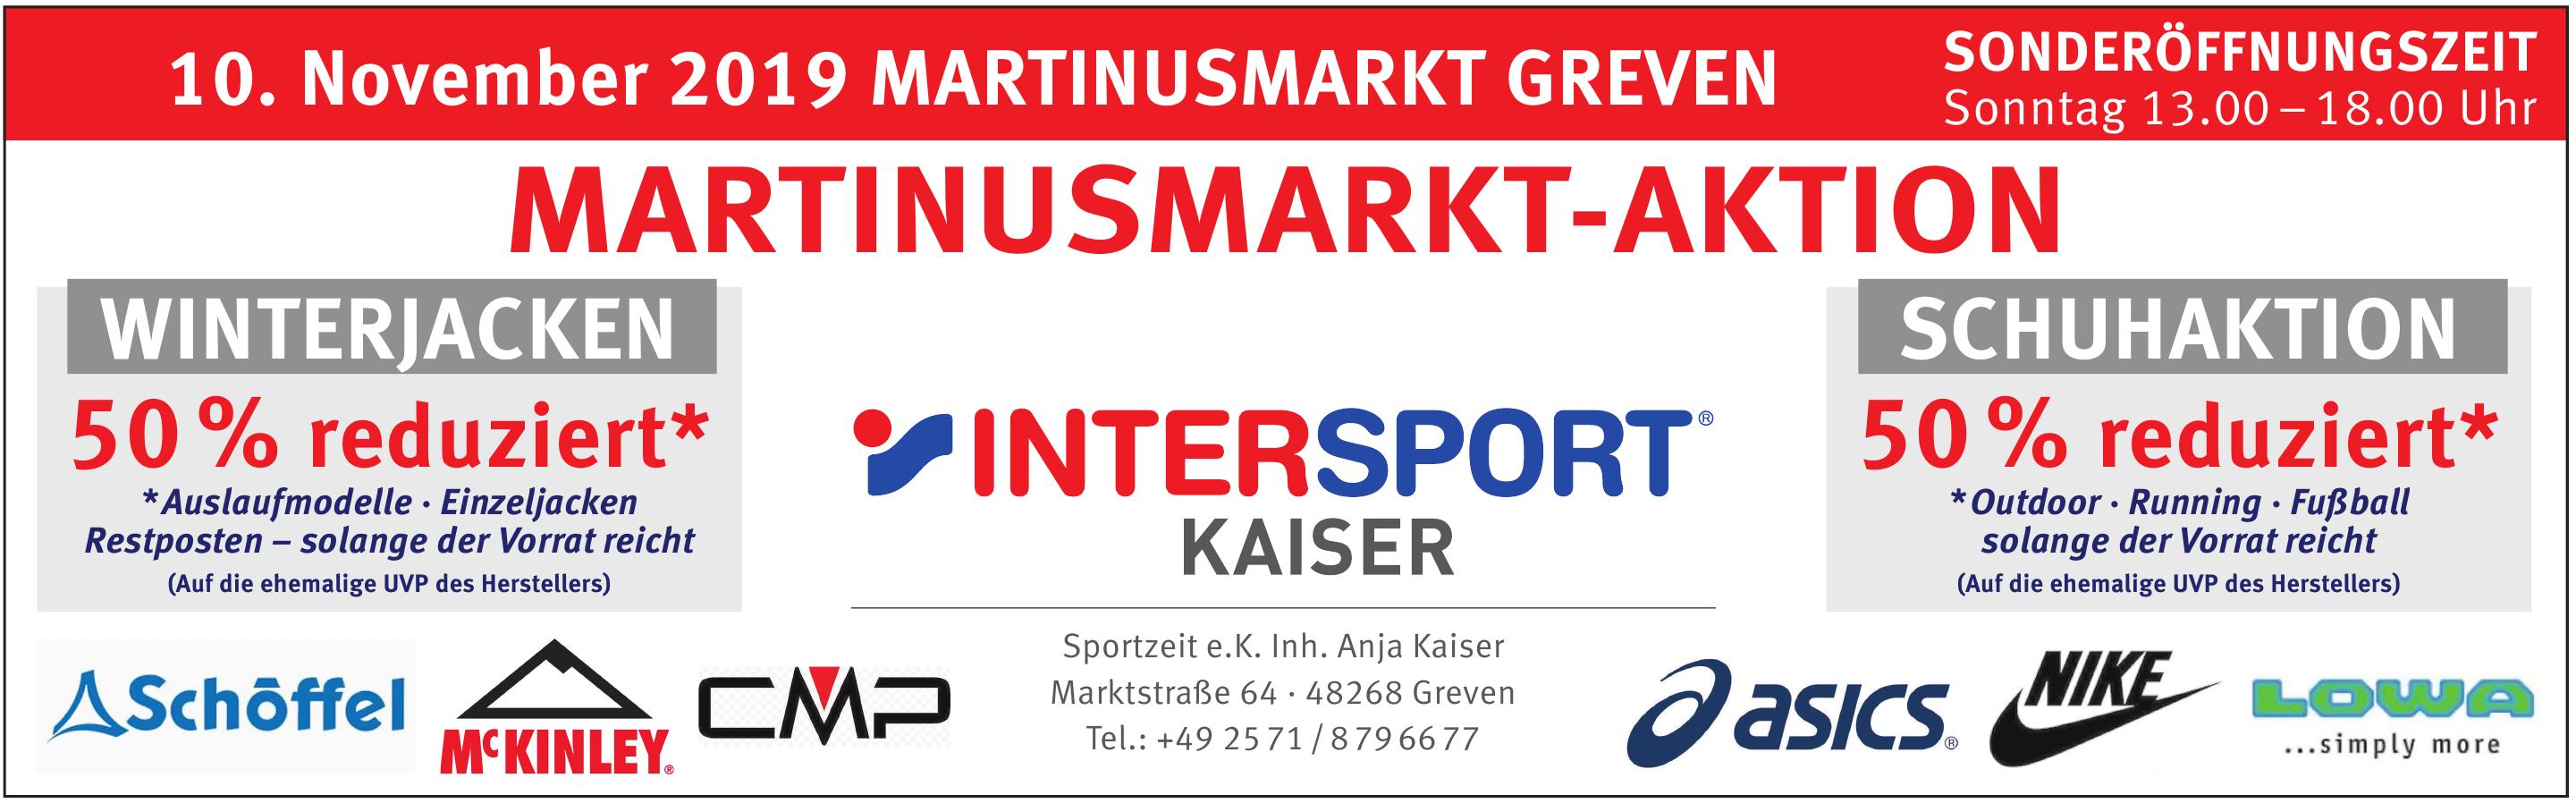 Intersport Sportzeit e.K. Inh. Anja Kaiser